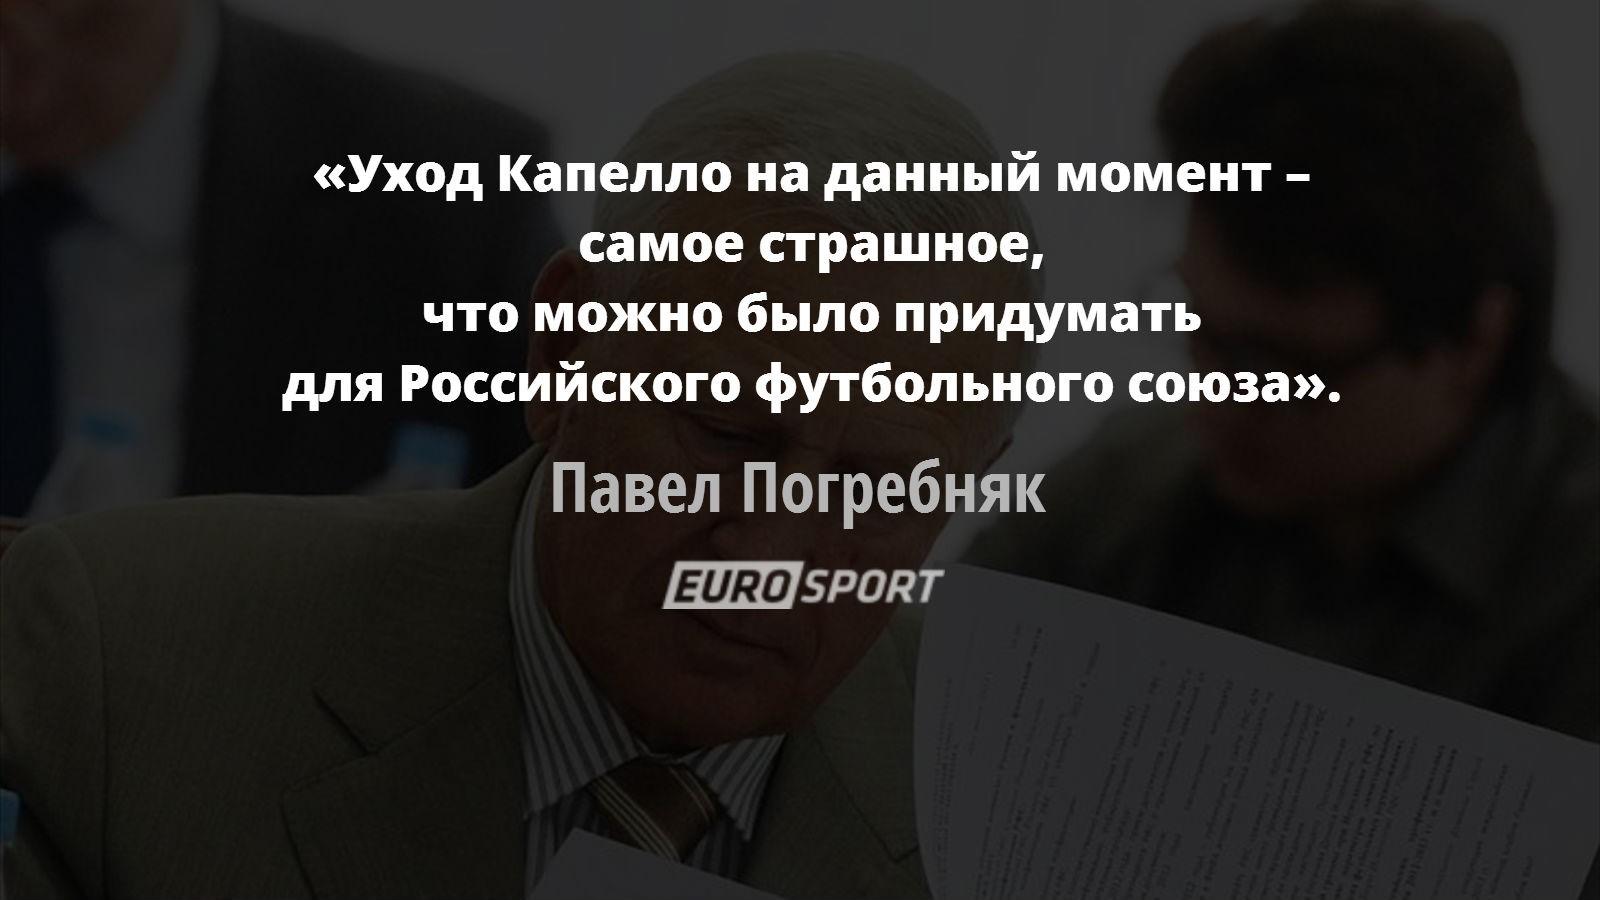 https://i.eurosport.com/2015/07/13/1639167.jpg